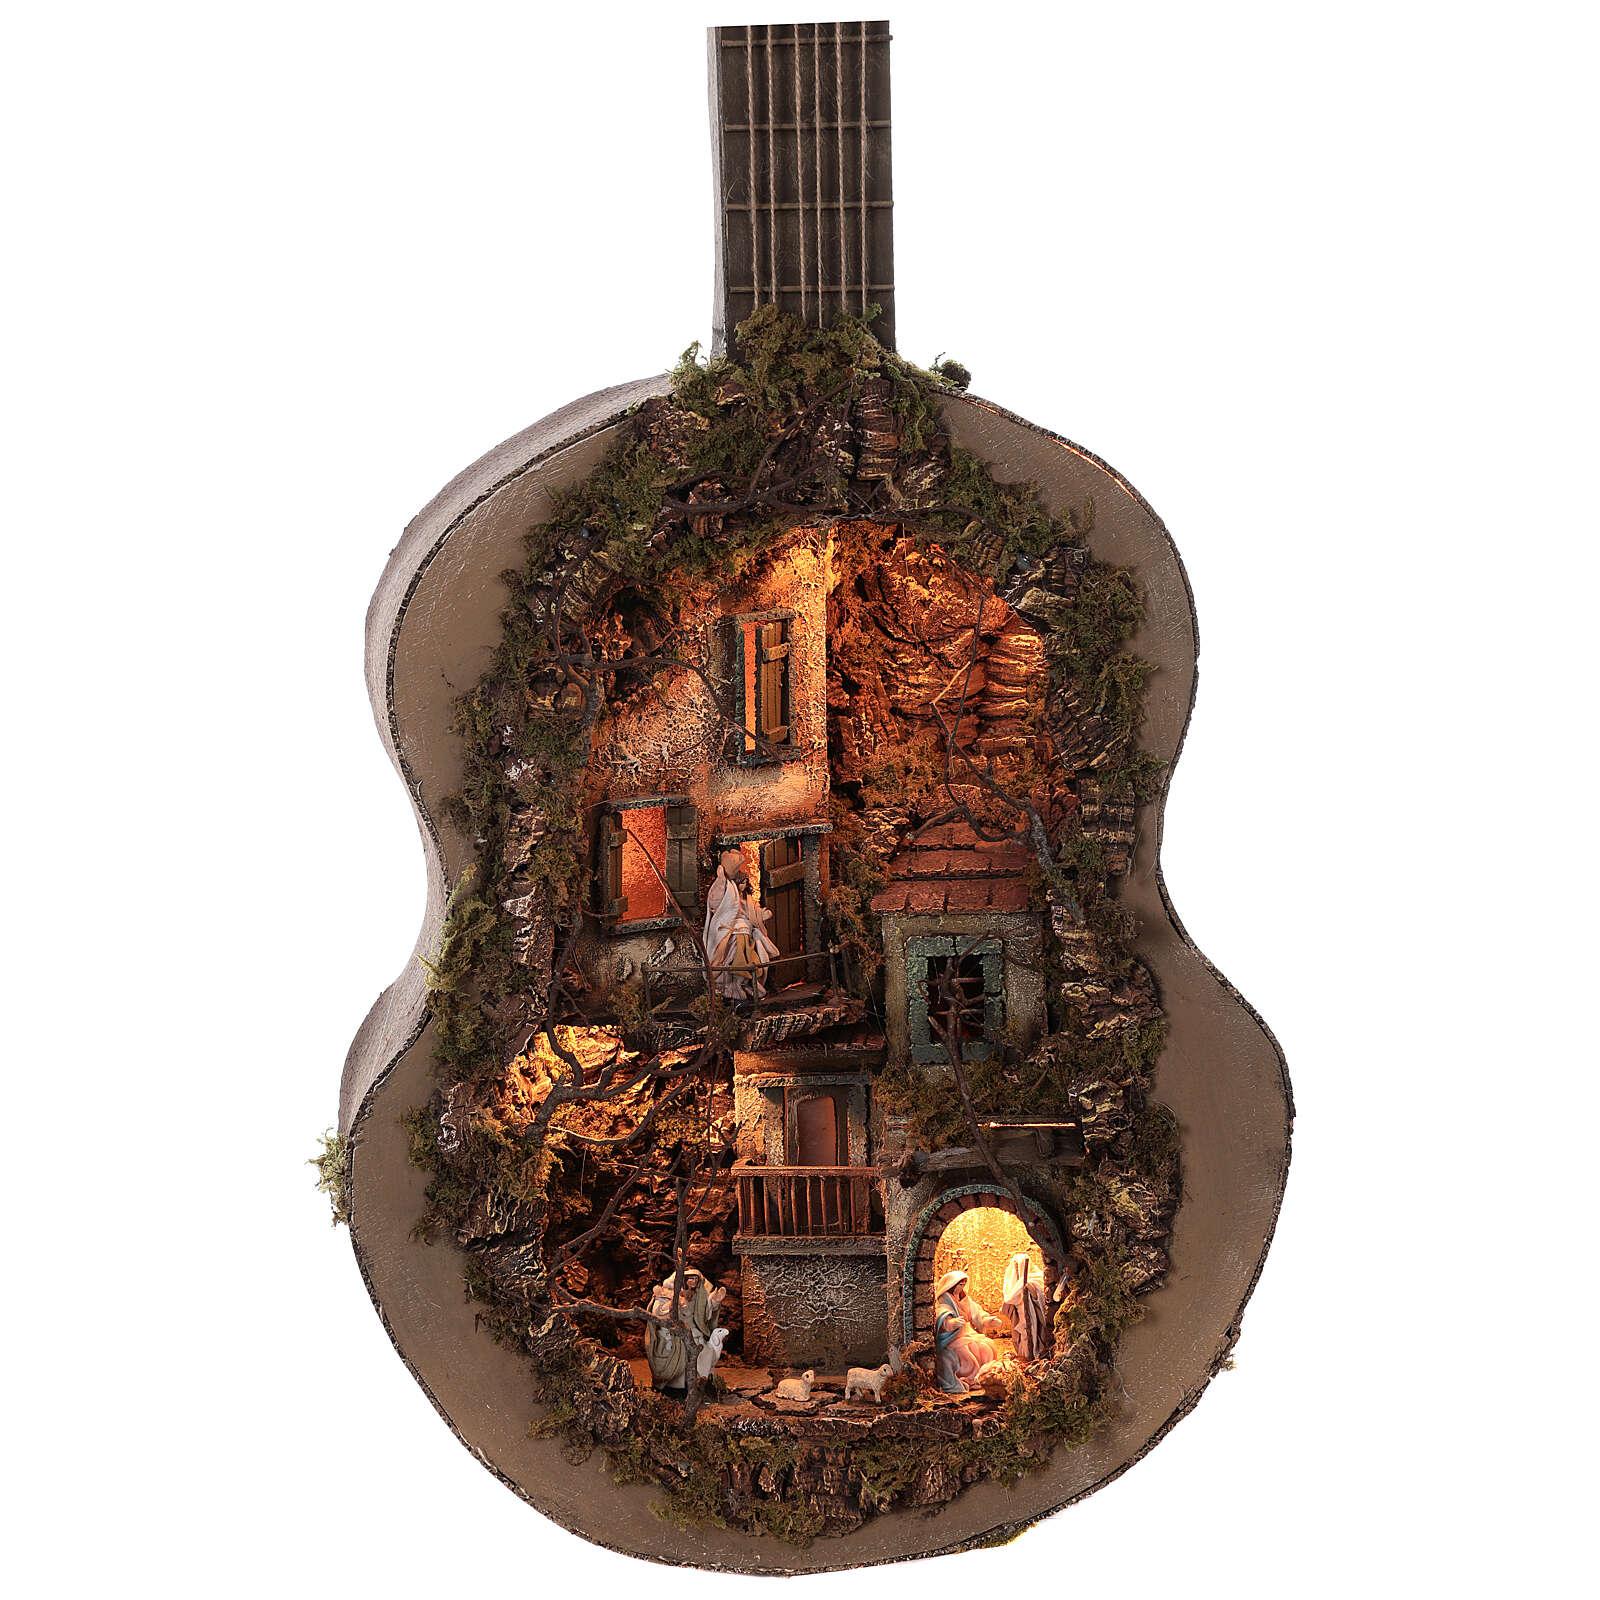 Neapolitan Nativity Scene in an iluminated guitare 125x50x20 cm for figurines of 6 cm average height 4